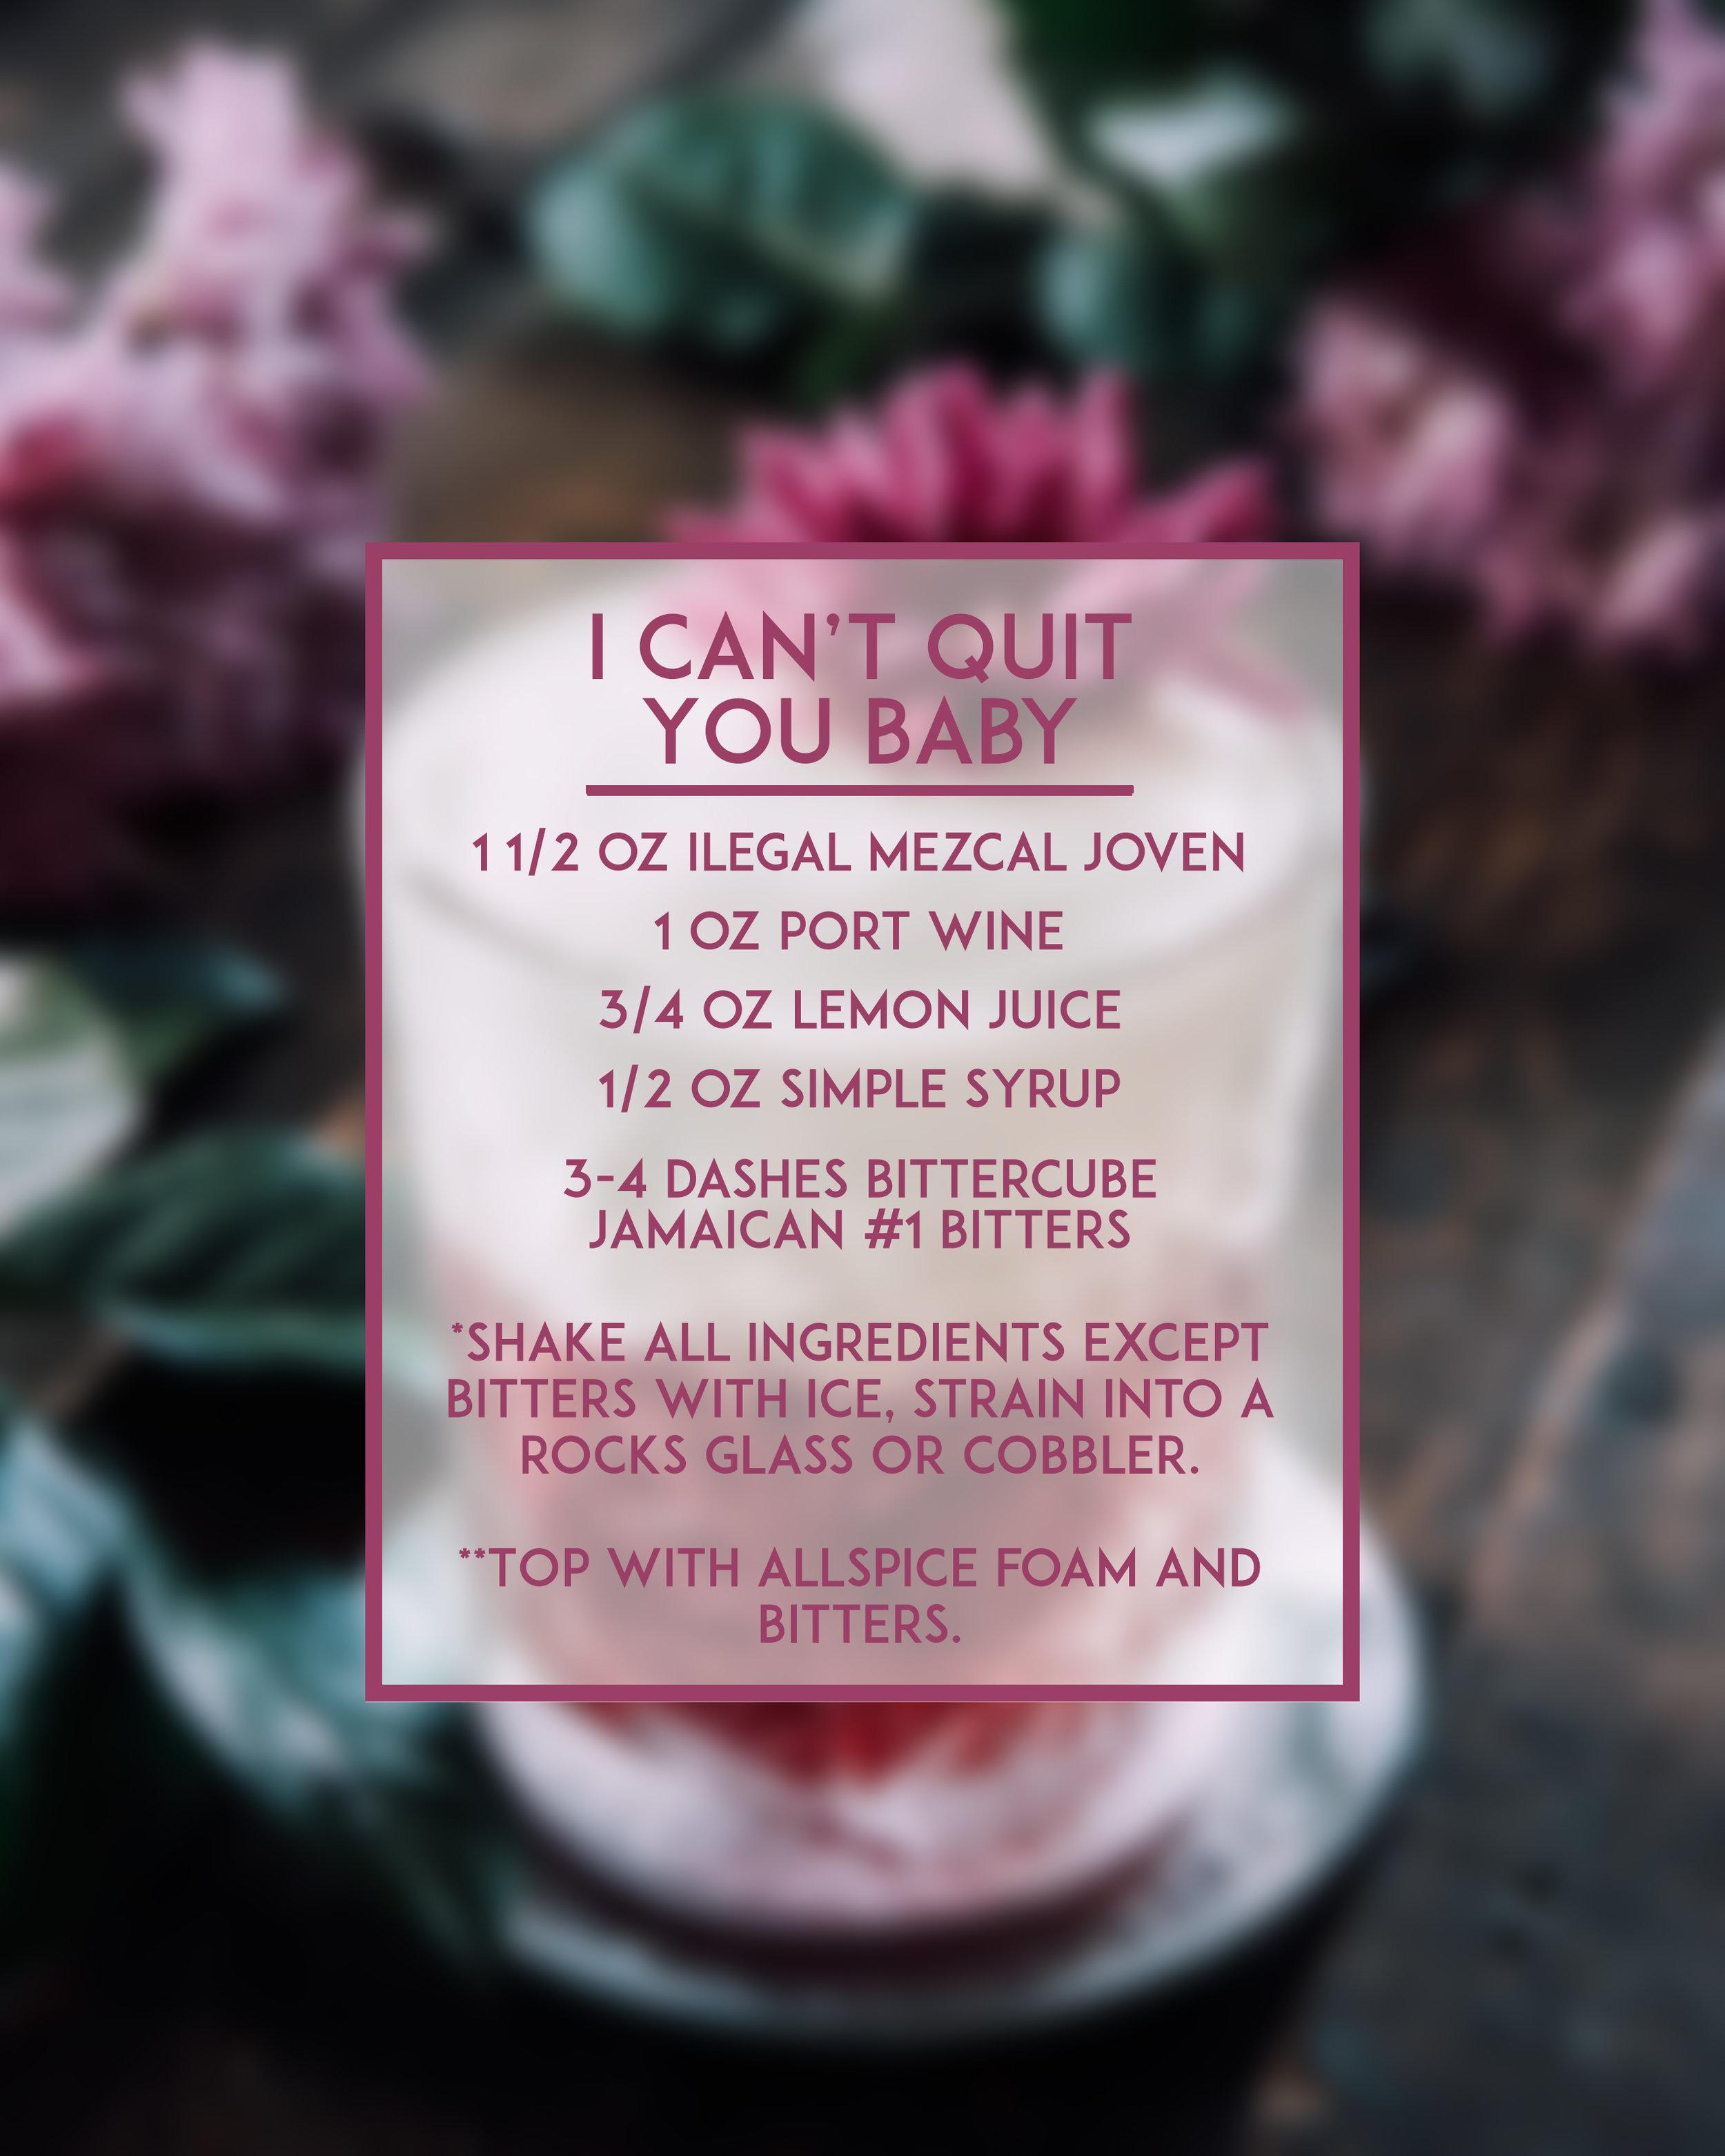 ValentinesDay_ACOTC (1 of 2)_A.jpg